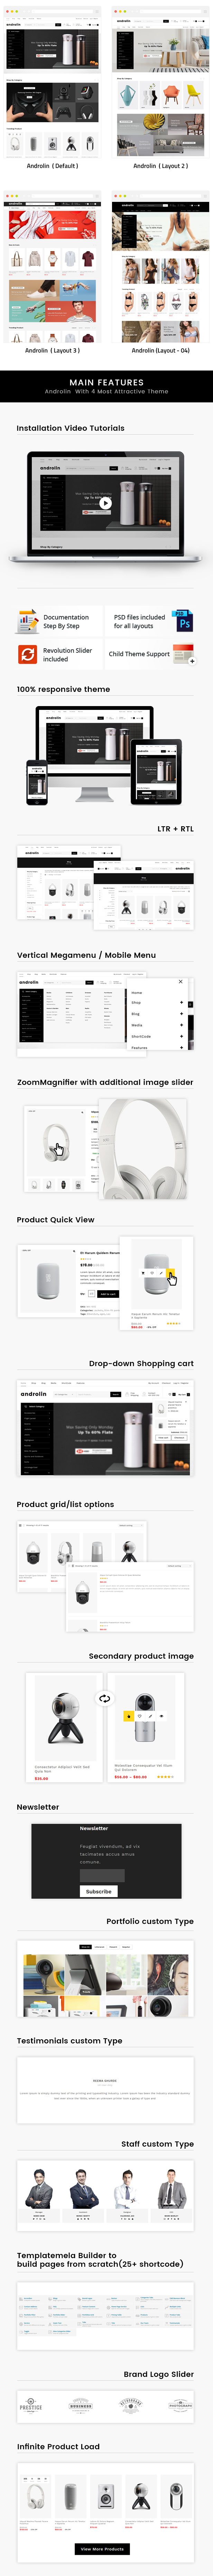 Androlin - Multipurpose WooCommerce Theme 8